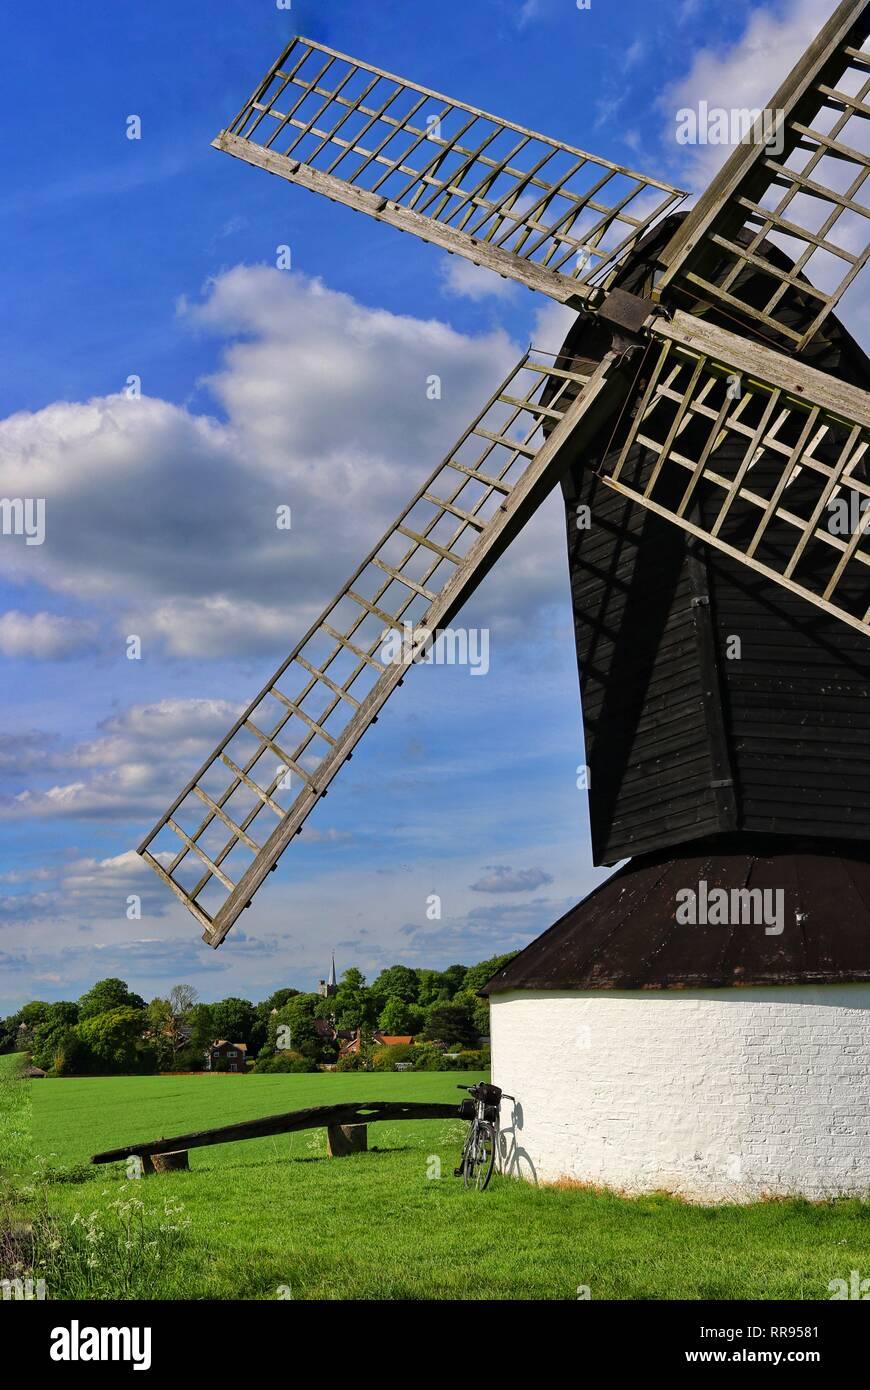 Pitstone windmill near Ivinghoe, Buckinghamshire, UK. - Stock Image